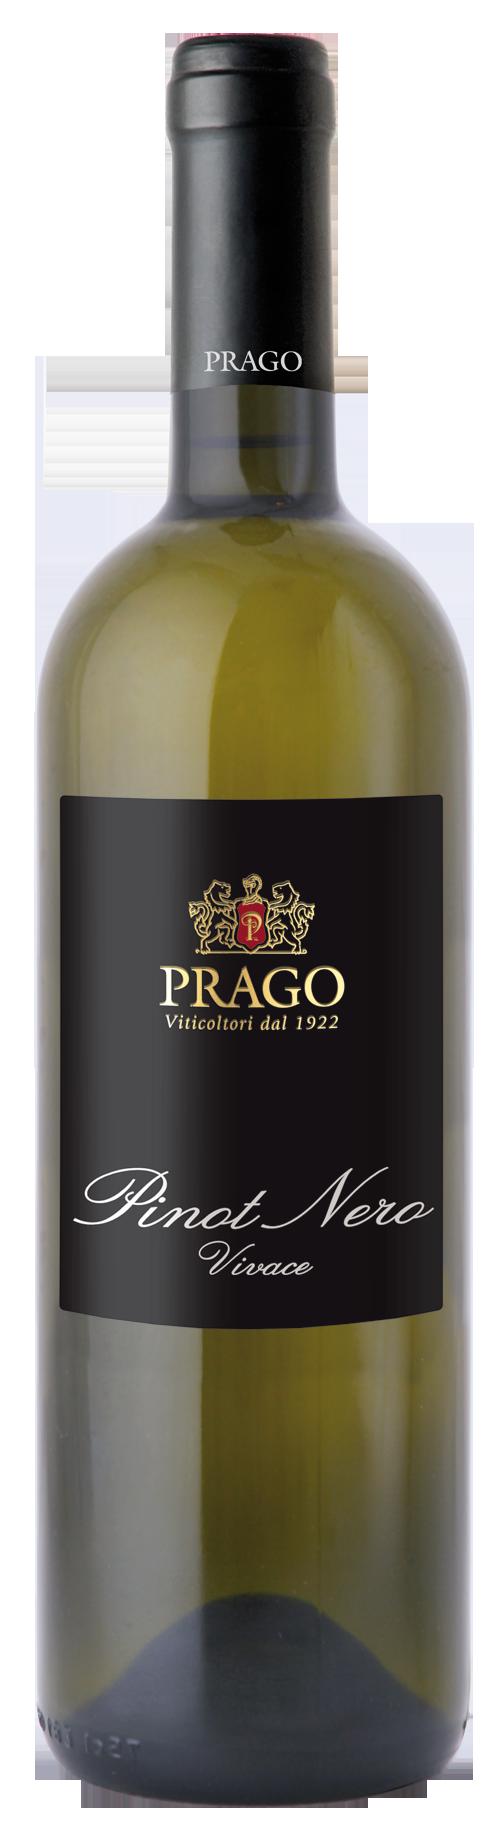 PRAGO Vini e Spumanti Oltrepò Pavese - Vini Vivaci - Pinot Nero vinificato Bianco